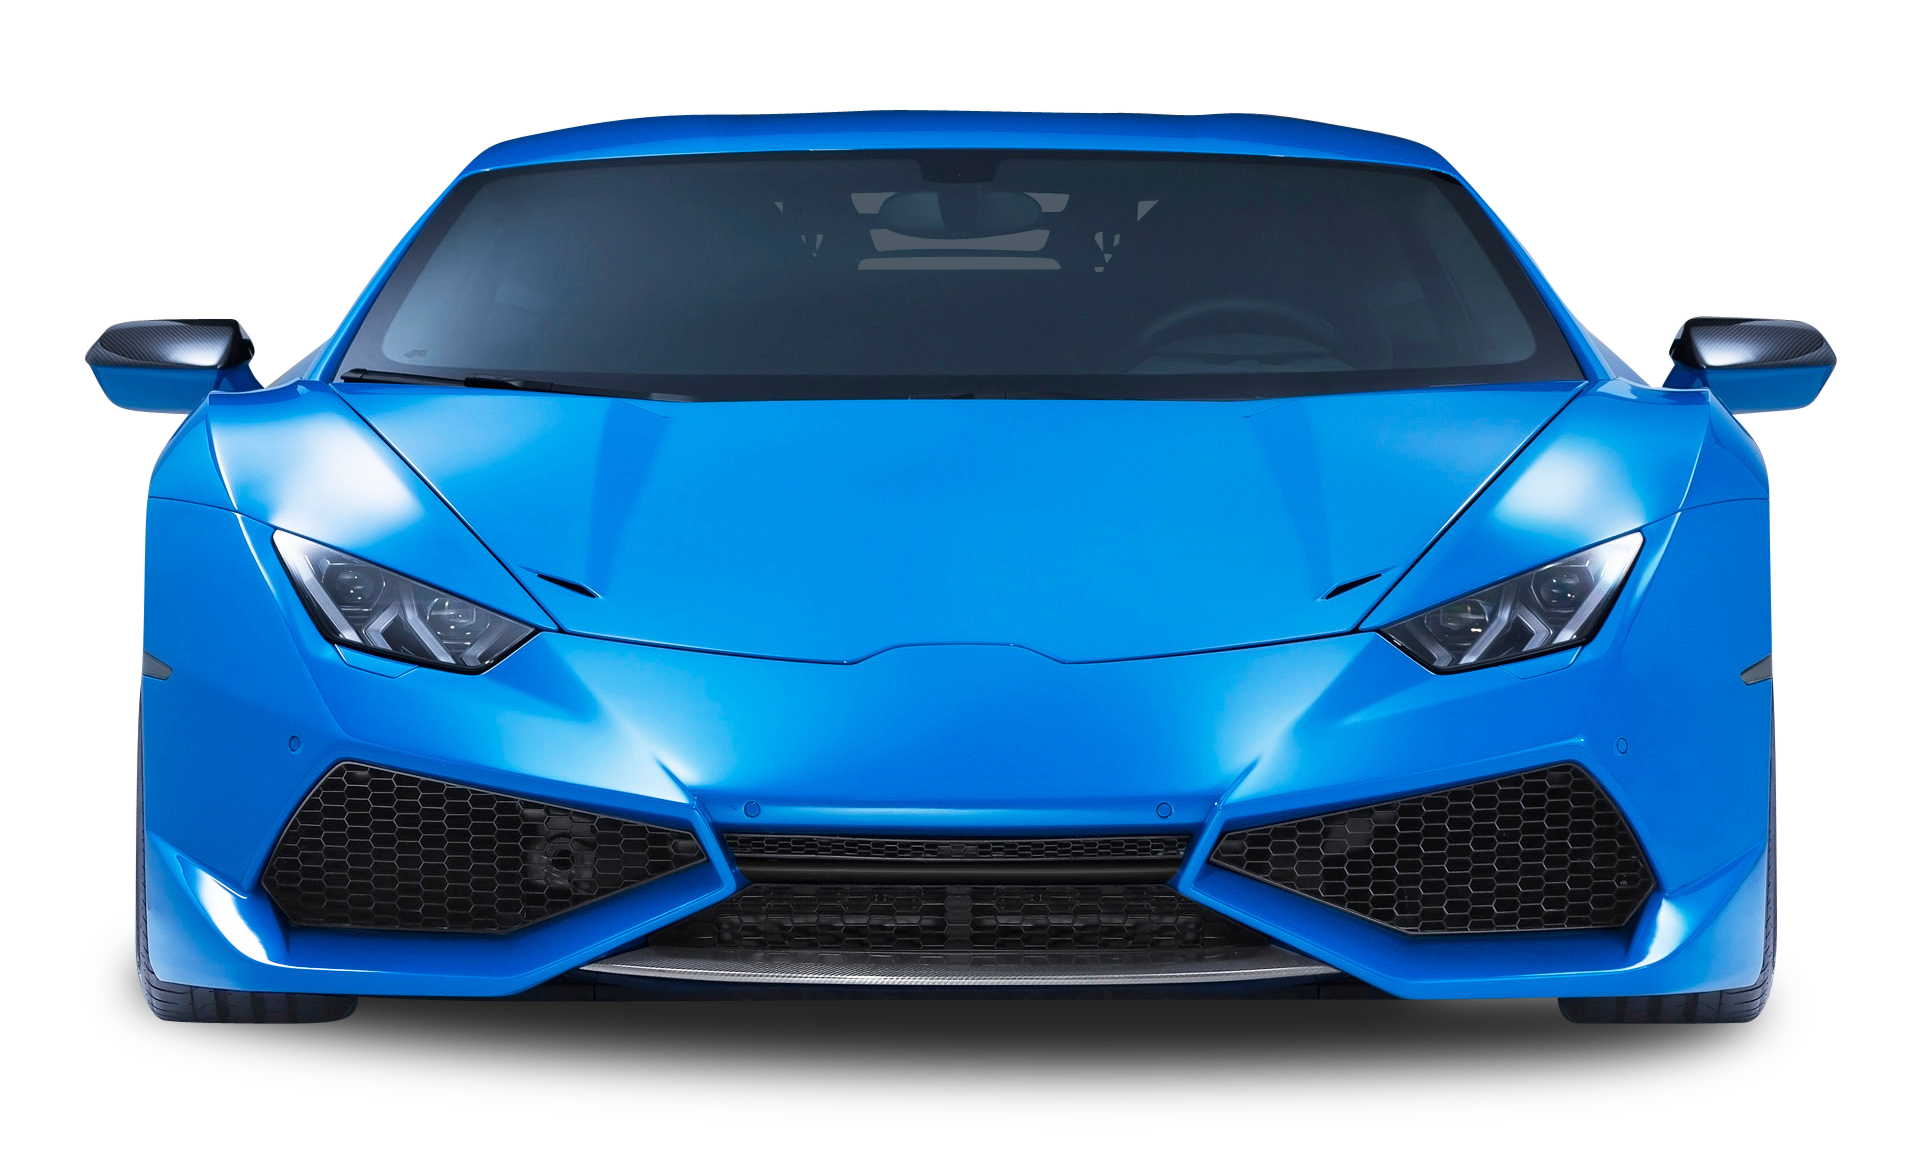 Lamborghini Huracan Front View Car Png Image Purepng Free